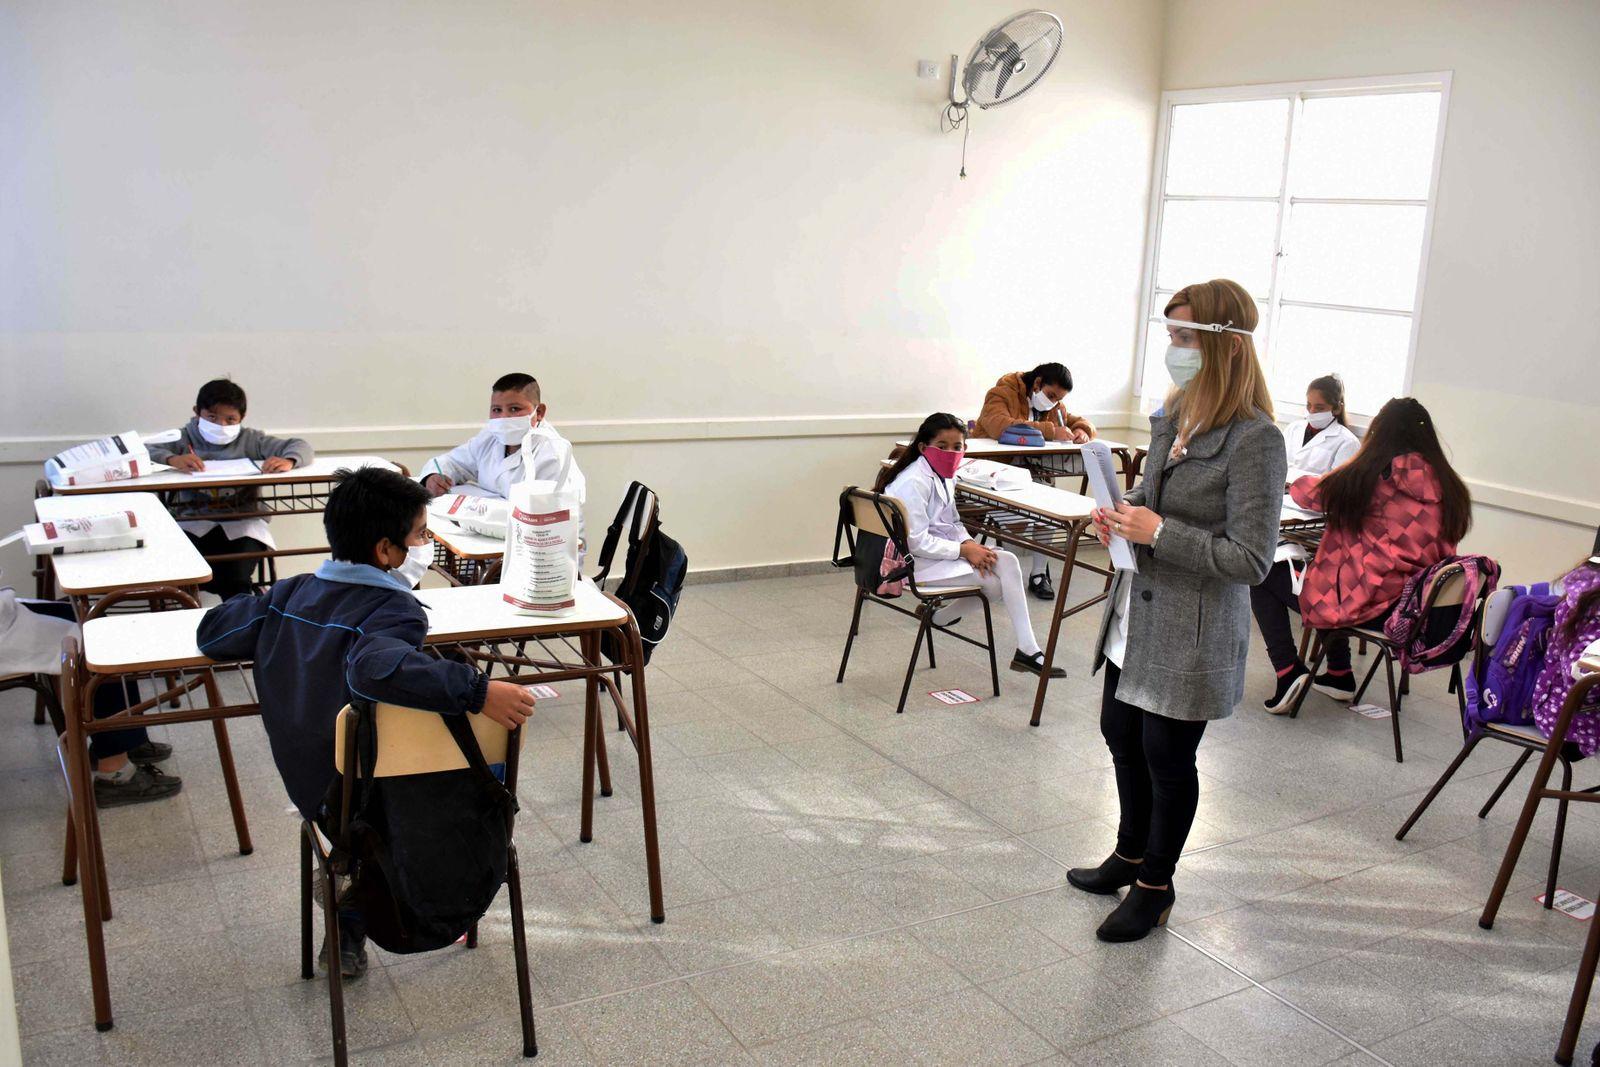 ARGENTINA-HEALTH-VIRUS-EDUCATION